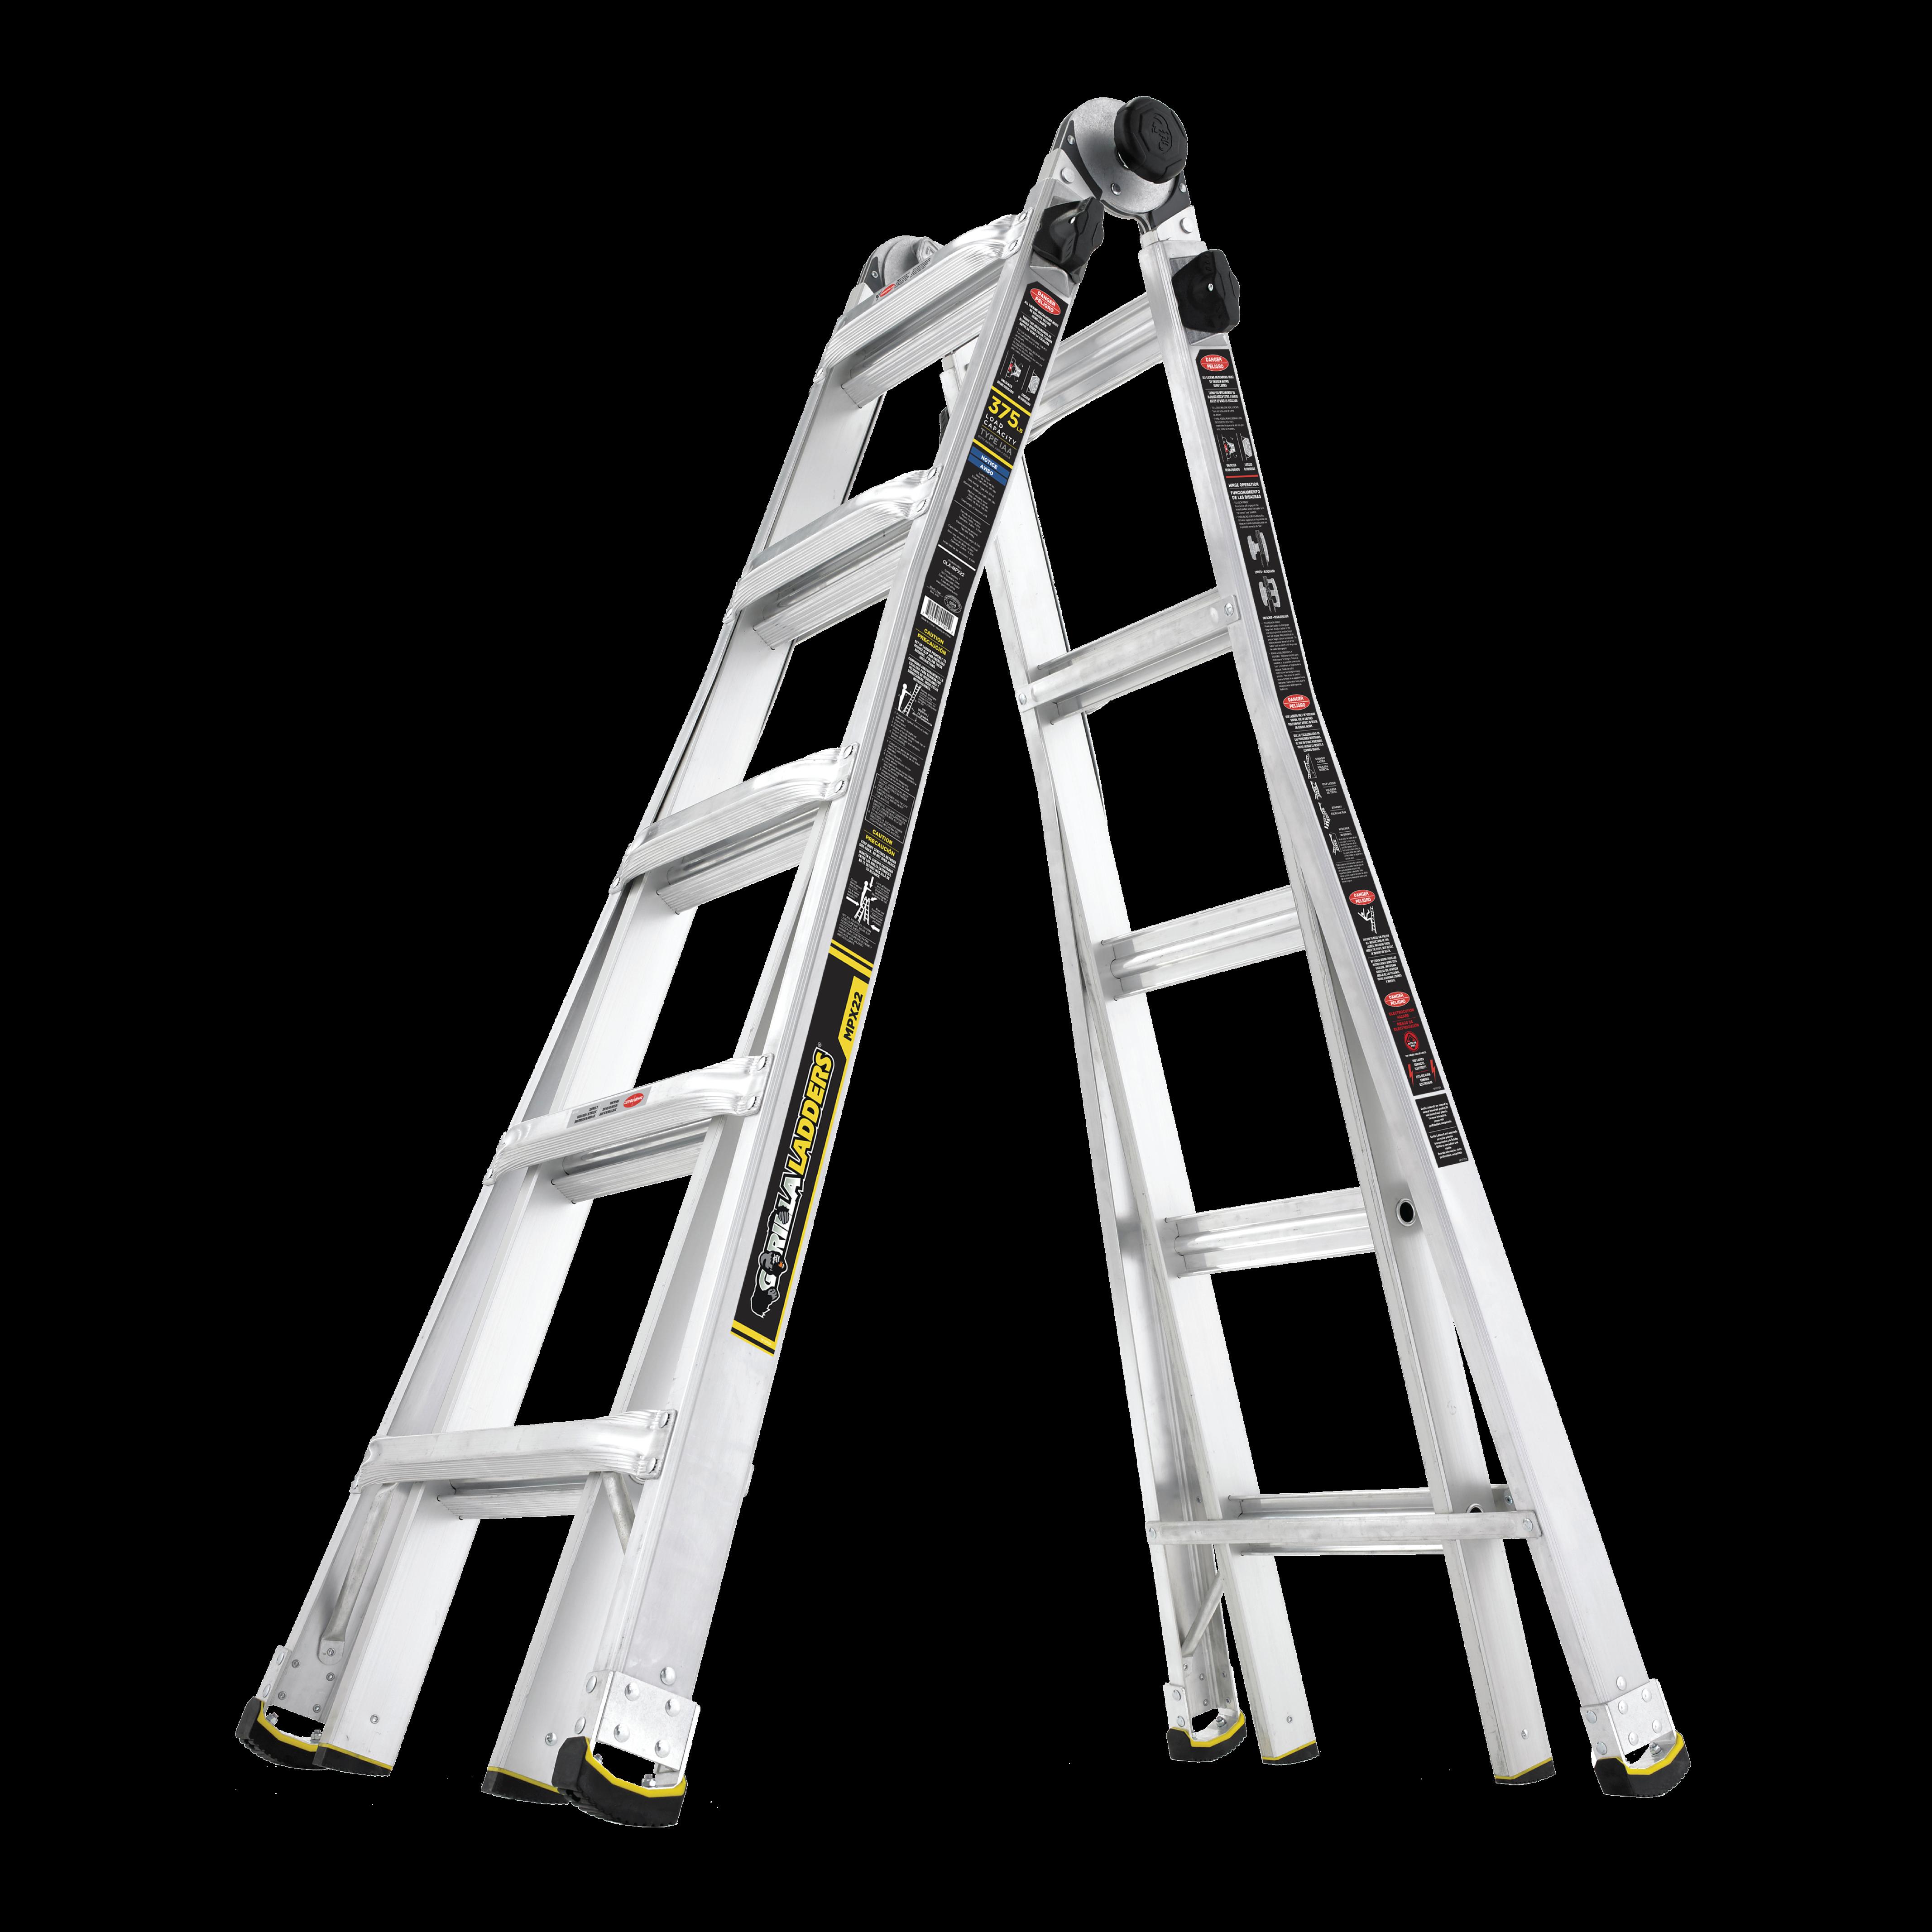 Gorilla Ladders Multi Position Ladders